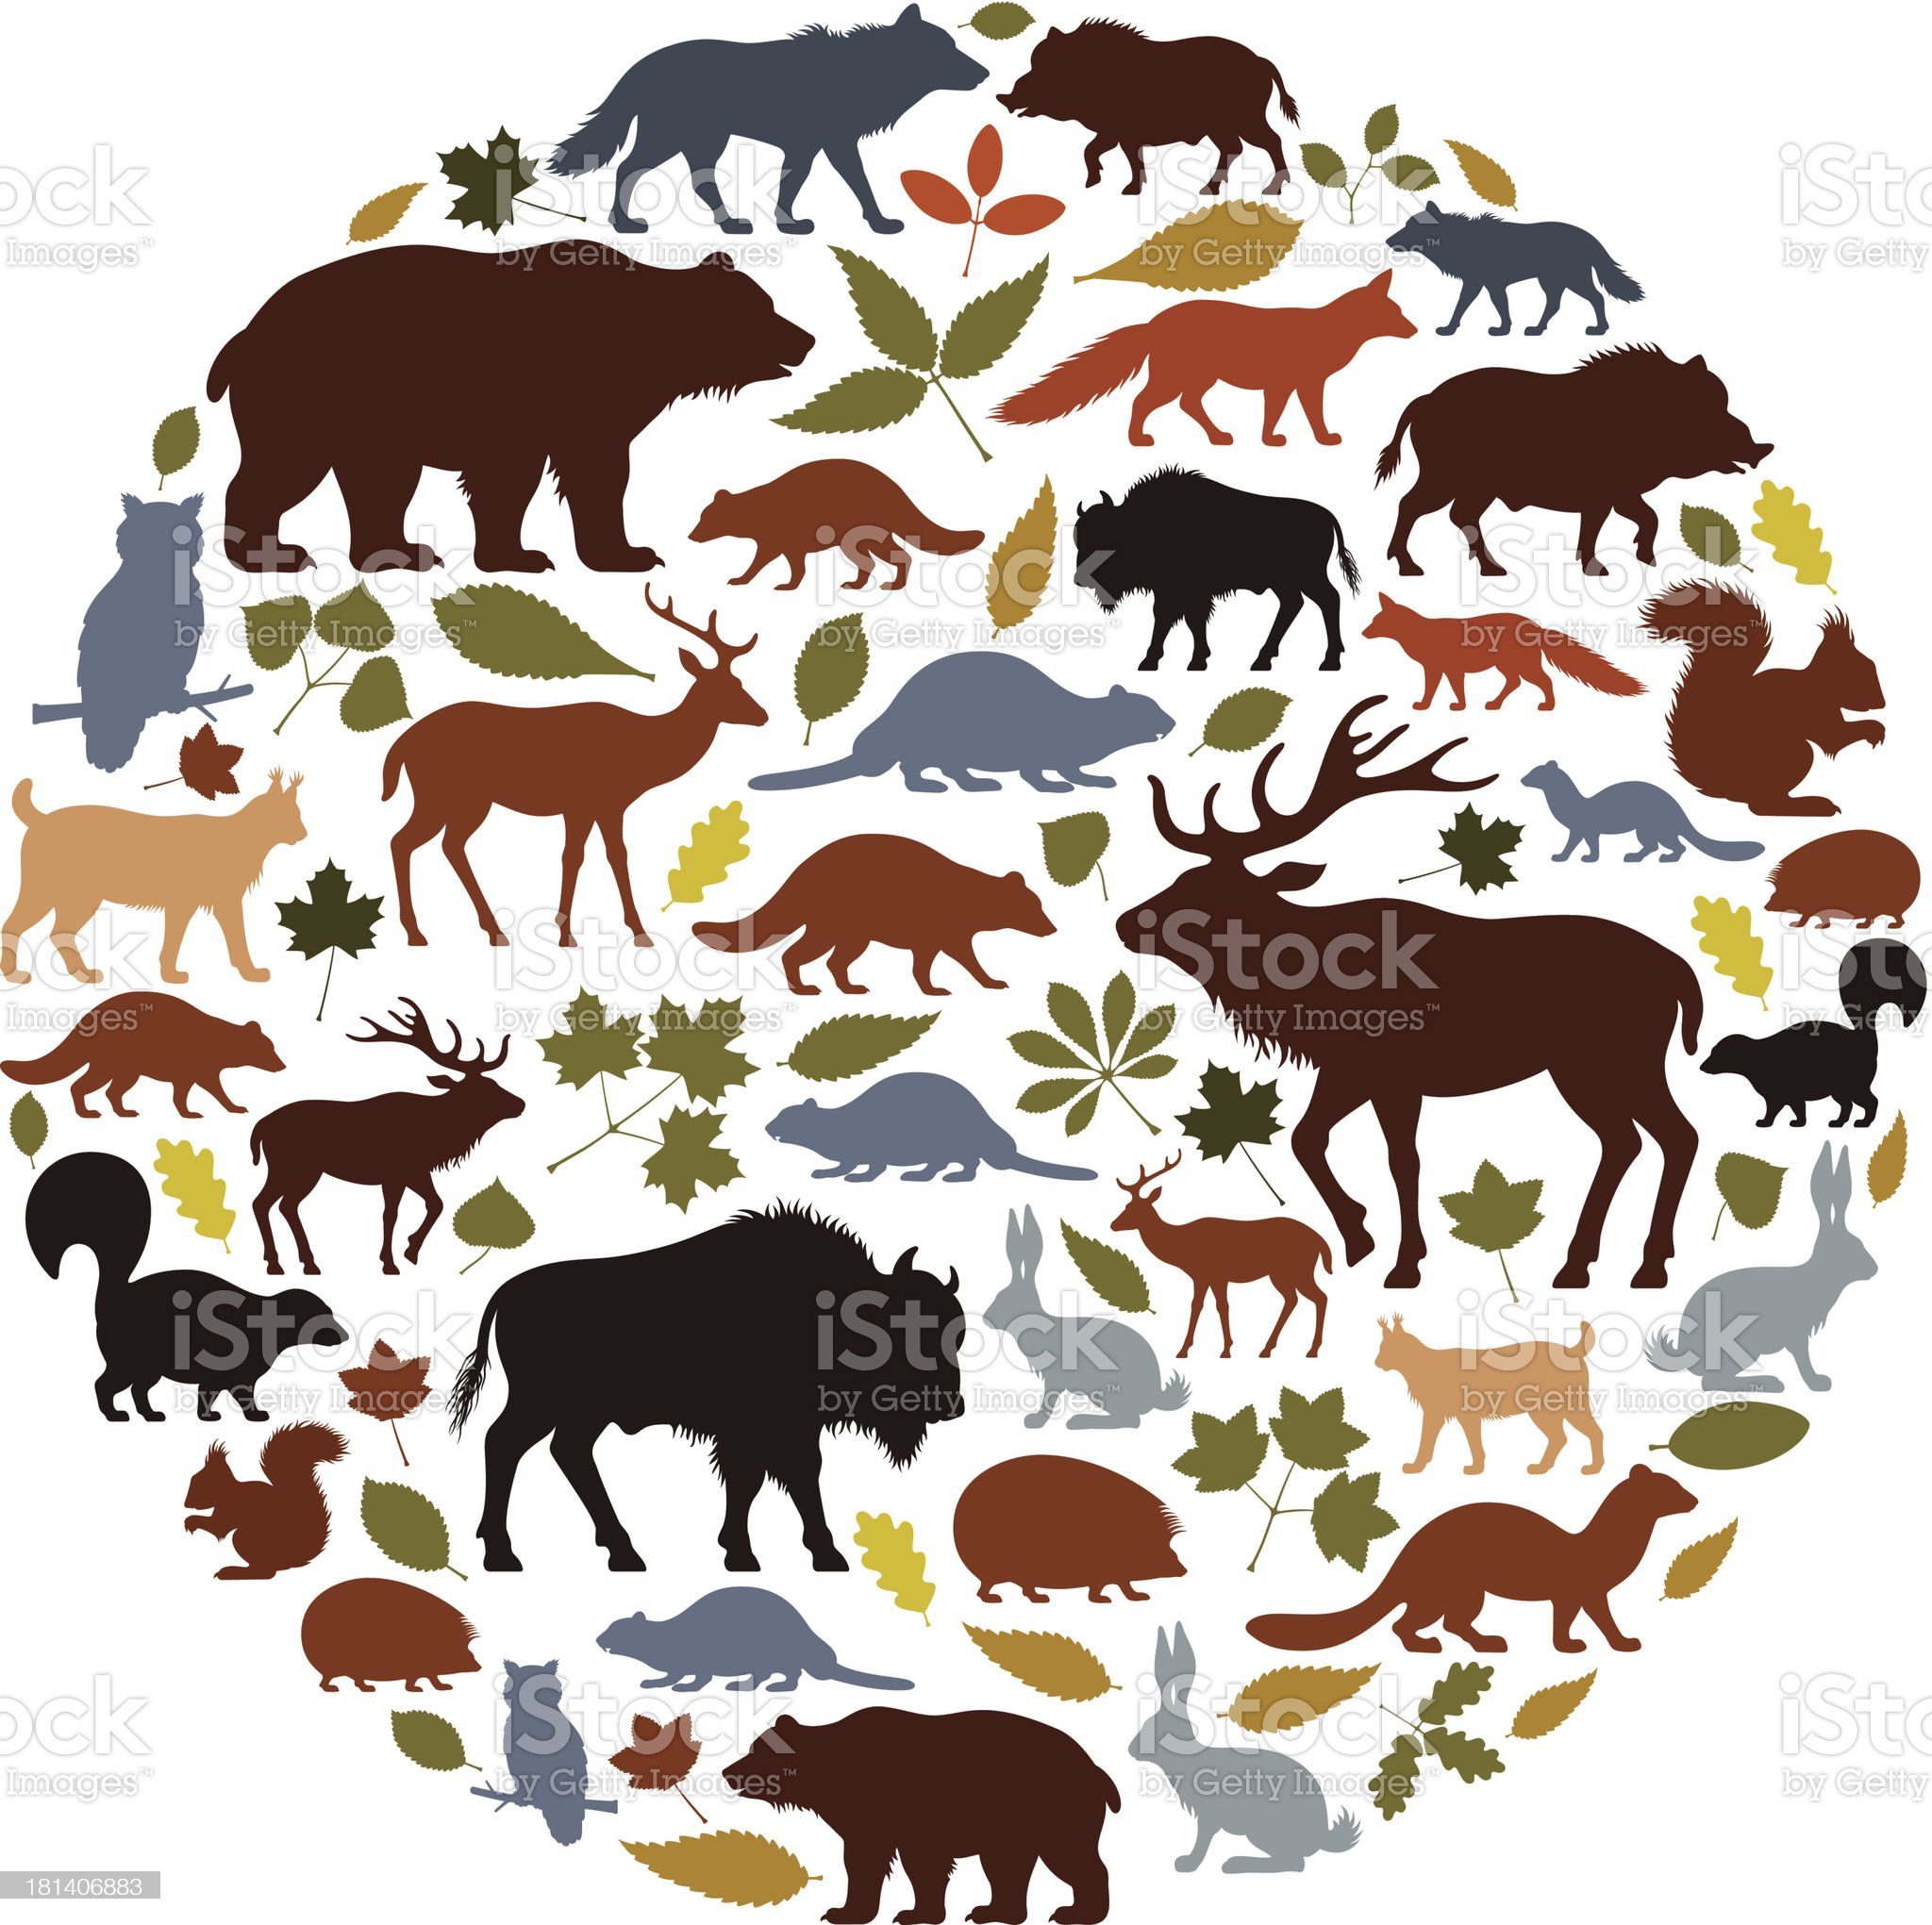 Wild Animals Icon Collage royalty-free stock vector art